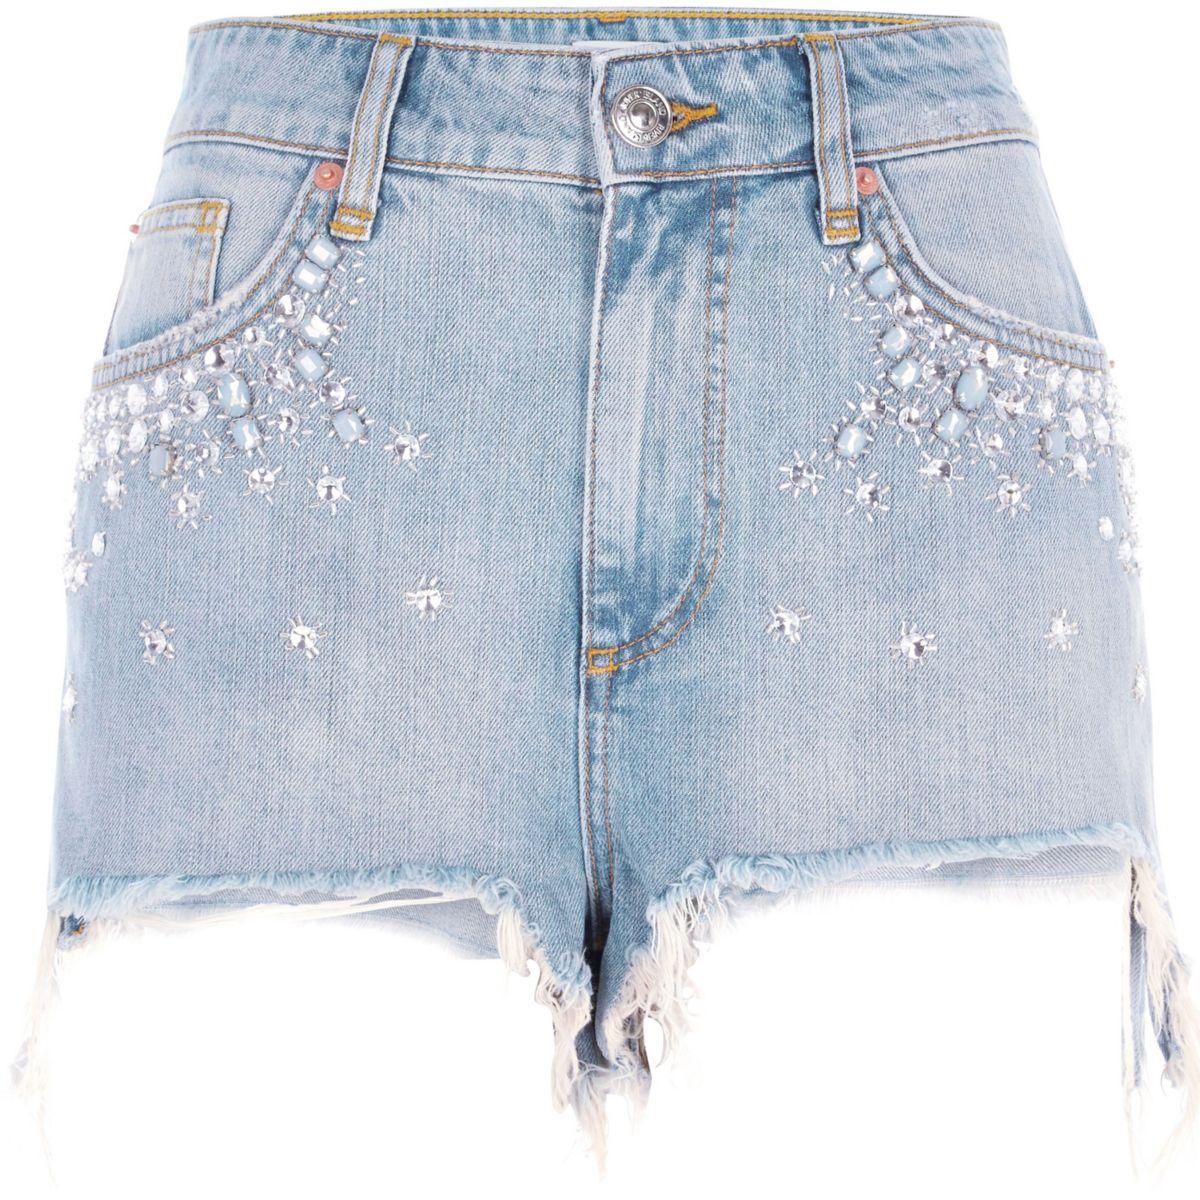 Blue embellished high waisted denim shorts